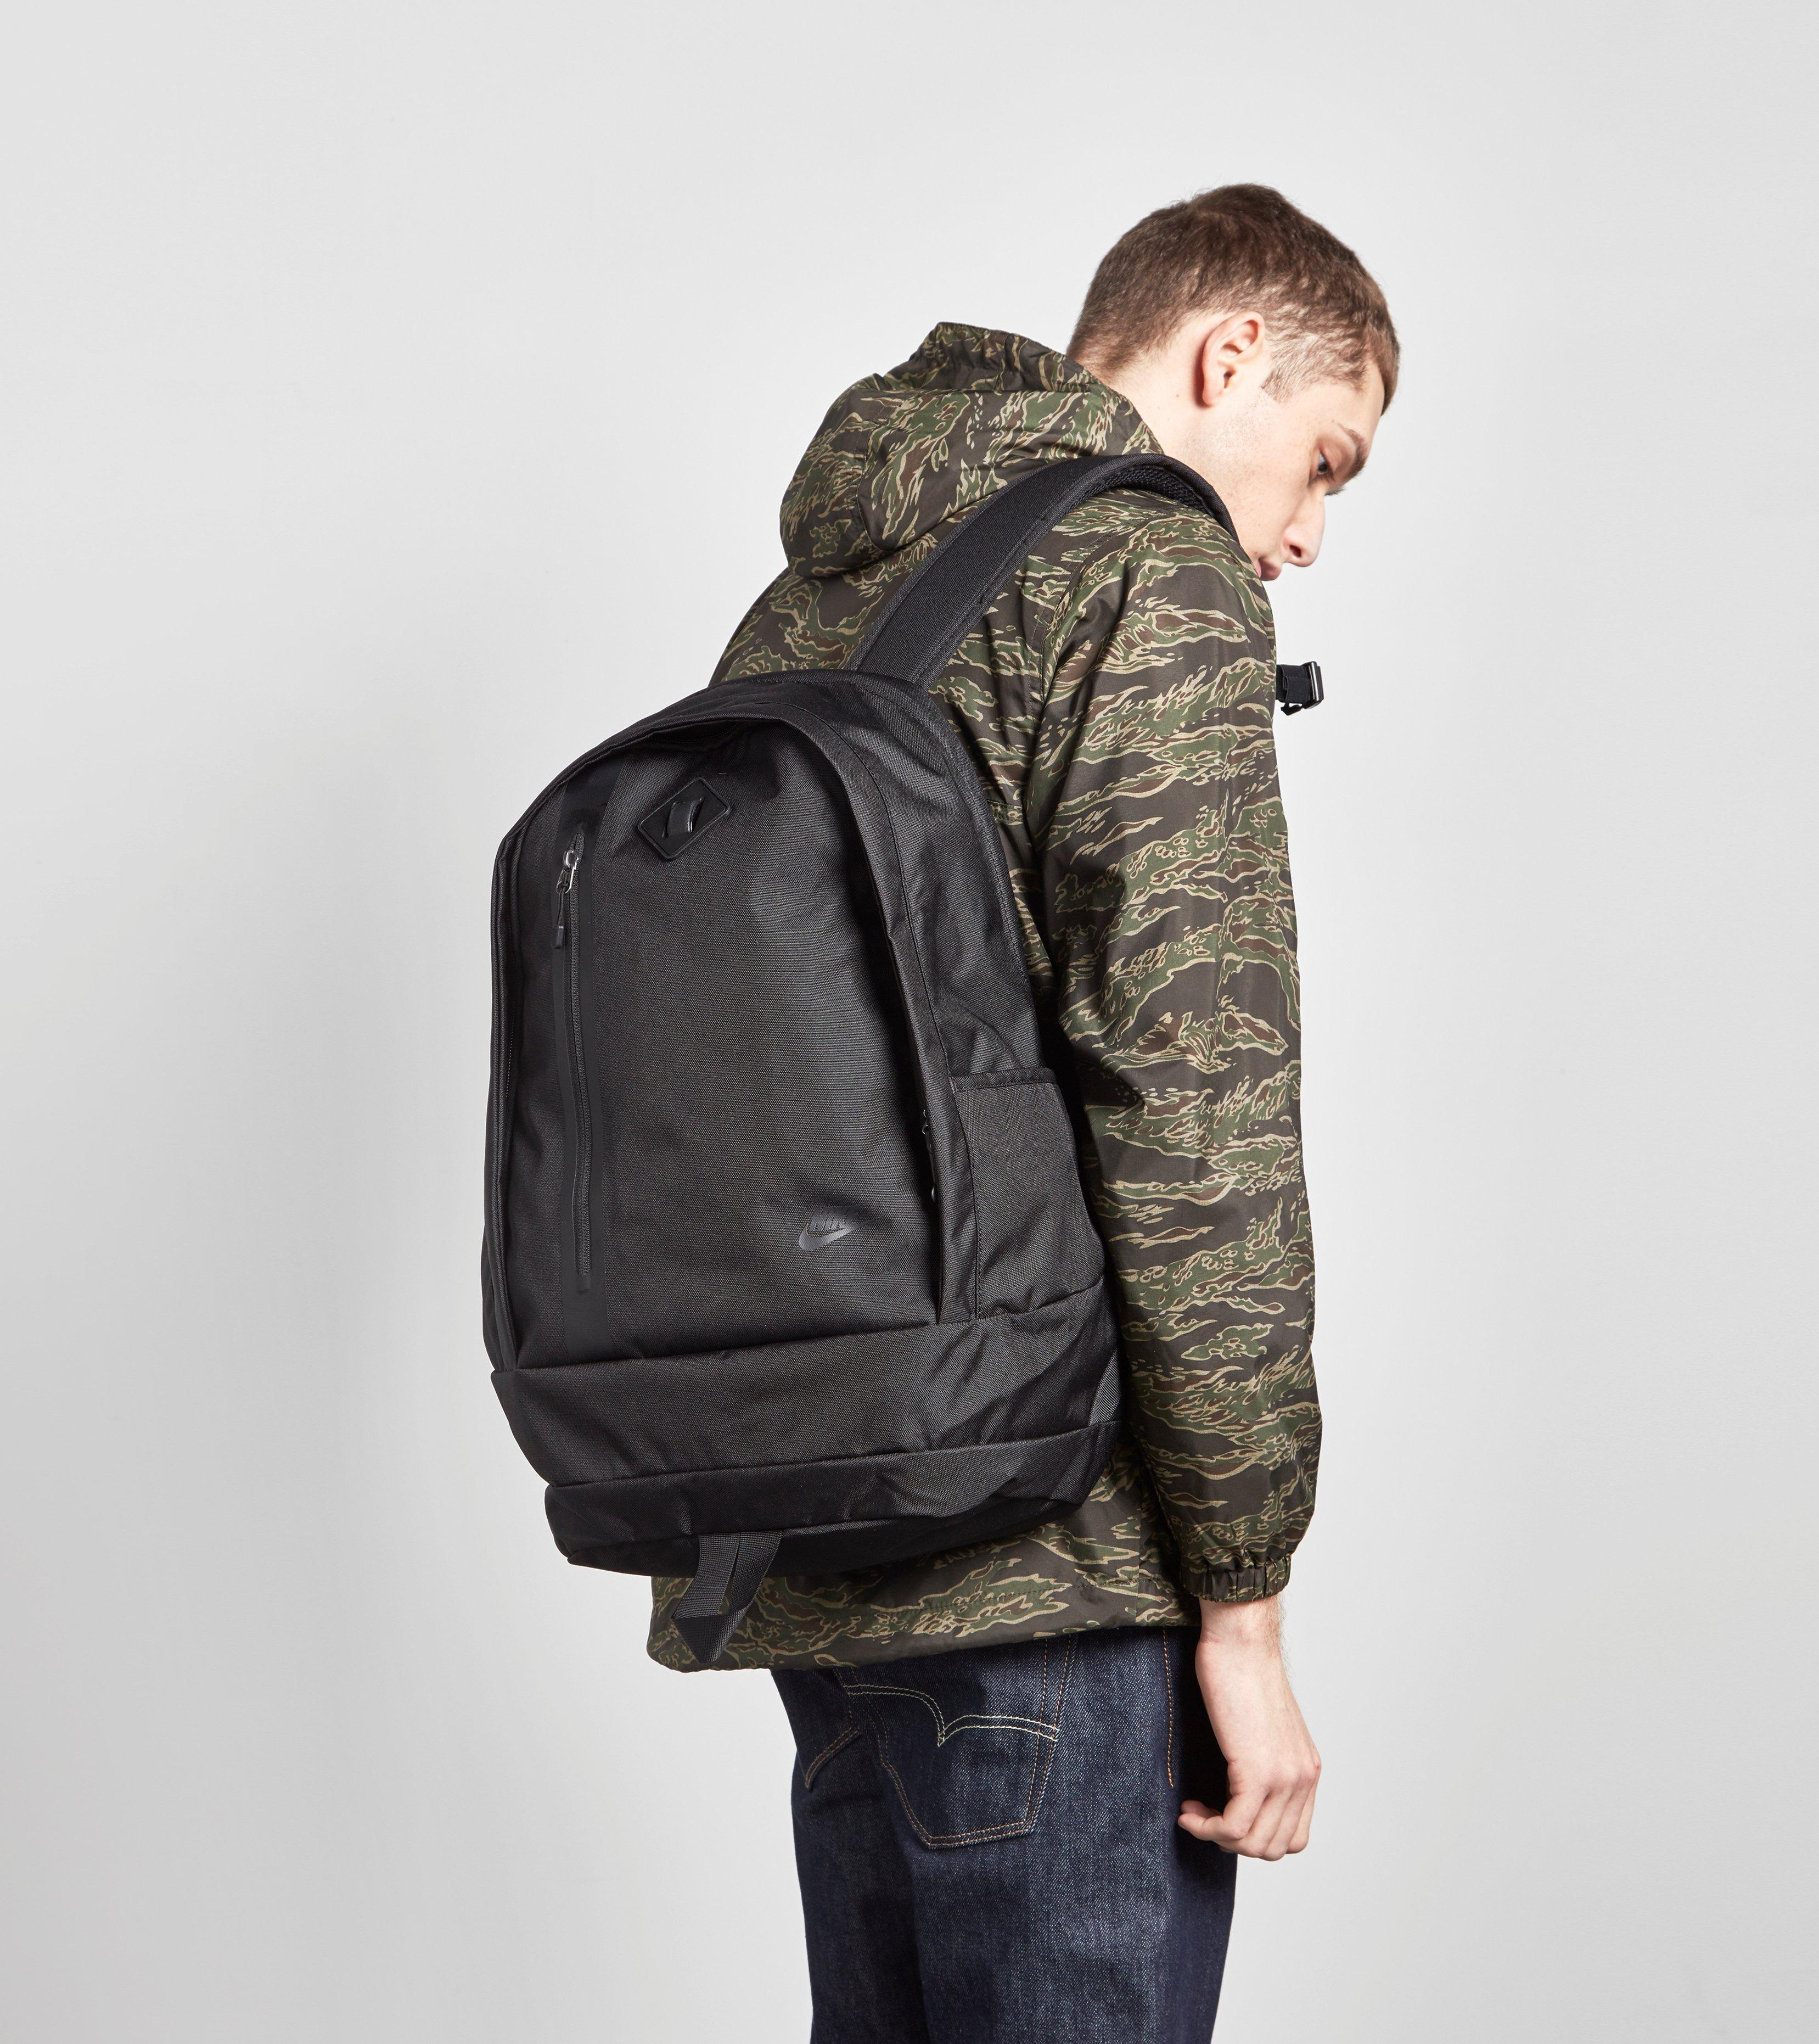 137c77467b Nike Cheyenne 3.0 Backpack in Black for Men - Lyst